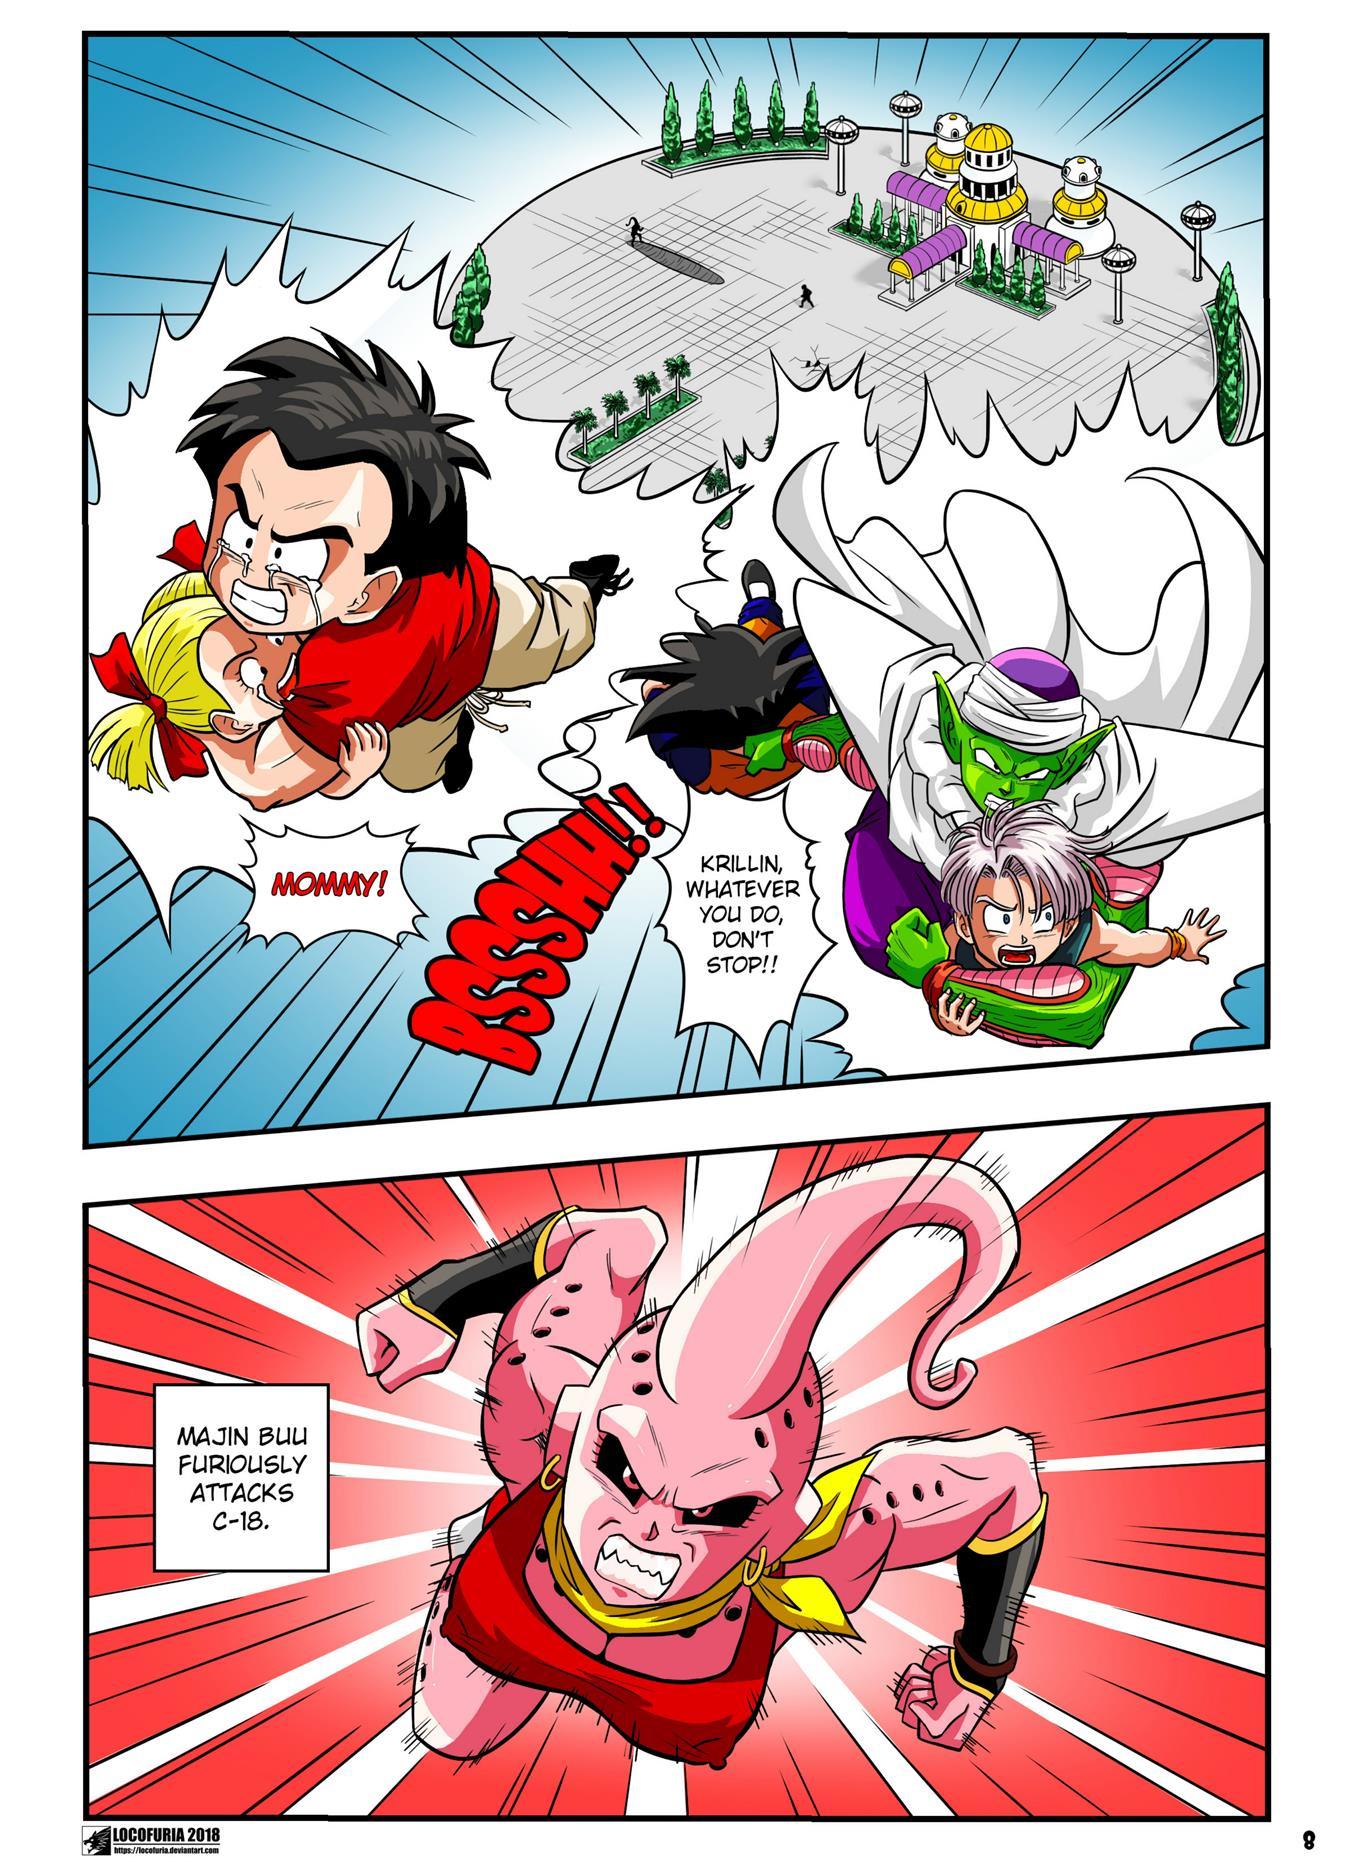 Buu's Bodies 3 (Dragon Ball Z) - Foto 10